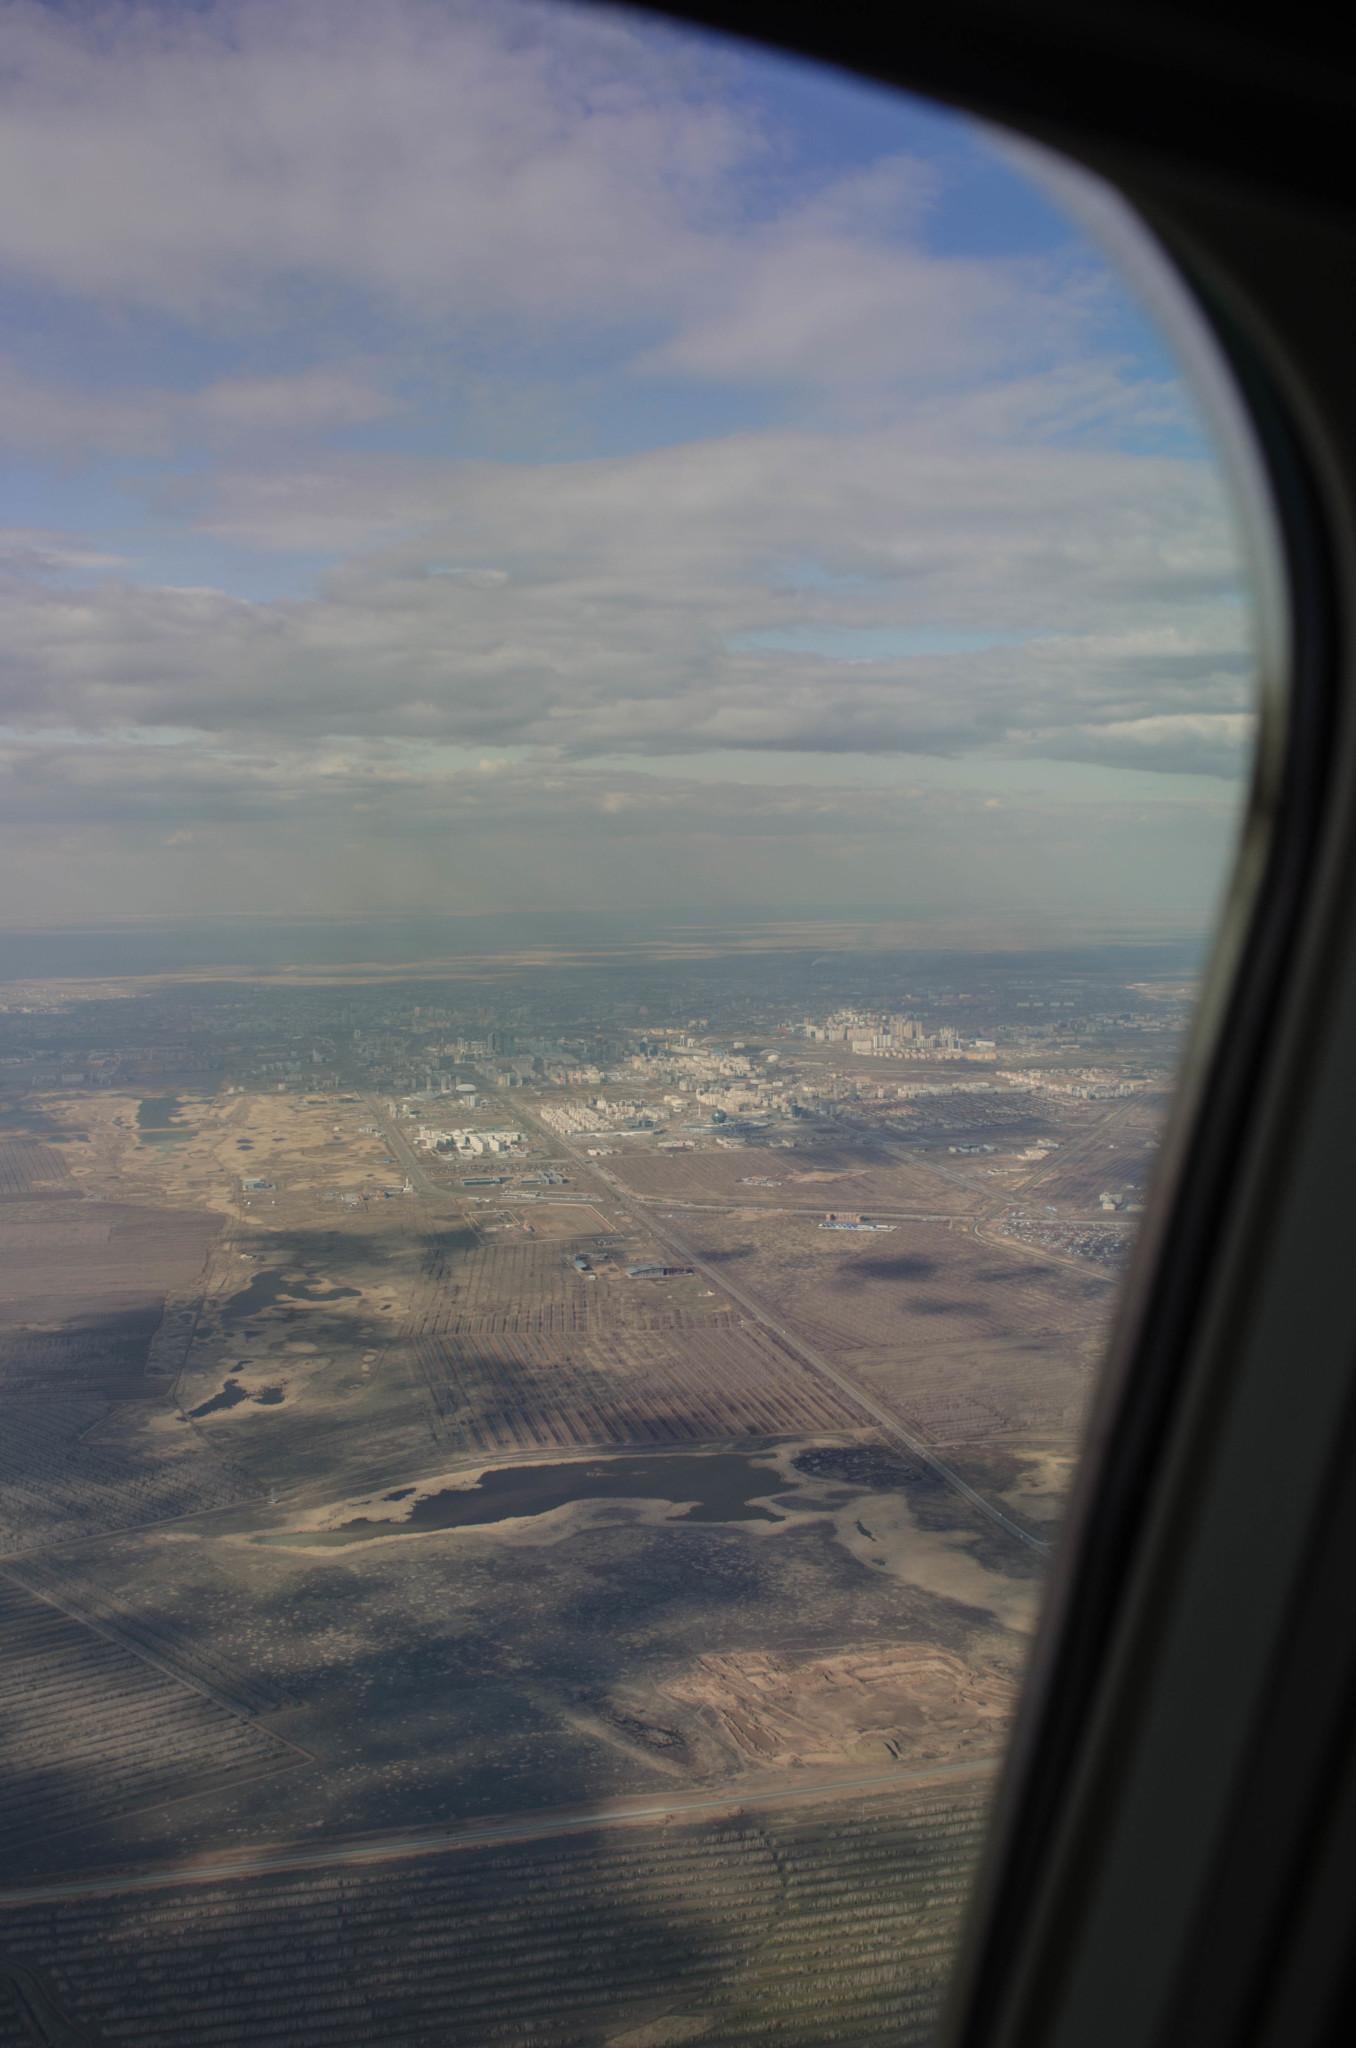 Aussicht aus dem Flugzeug der Air Astana